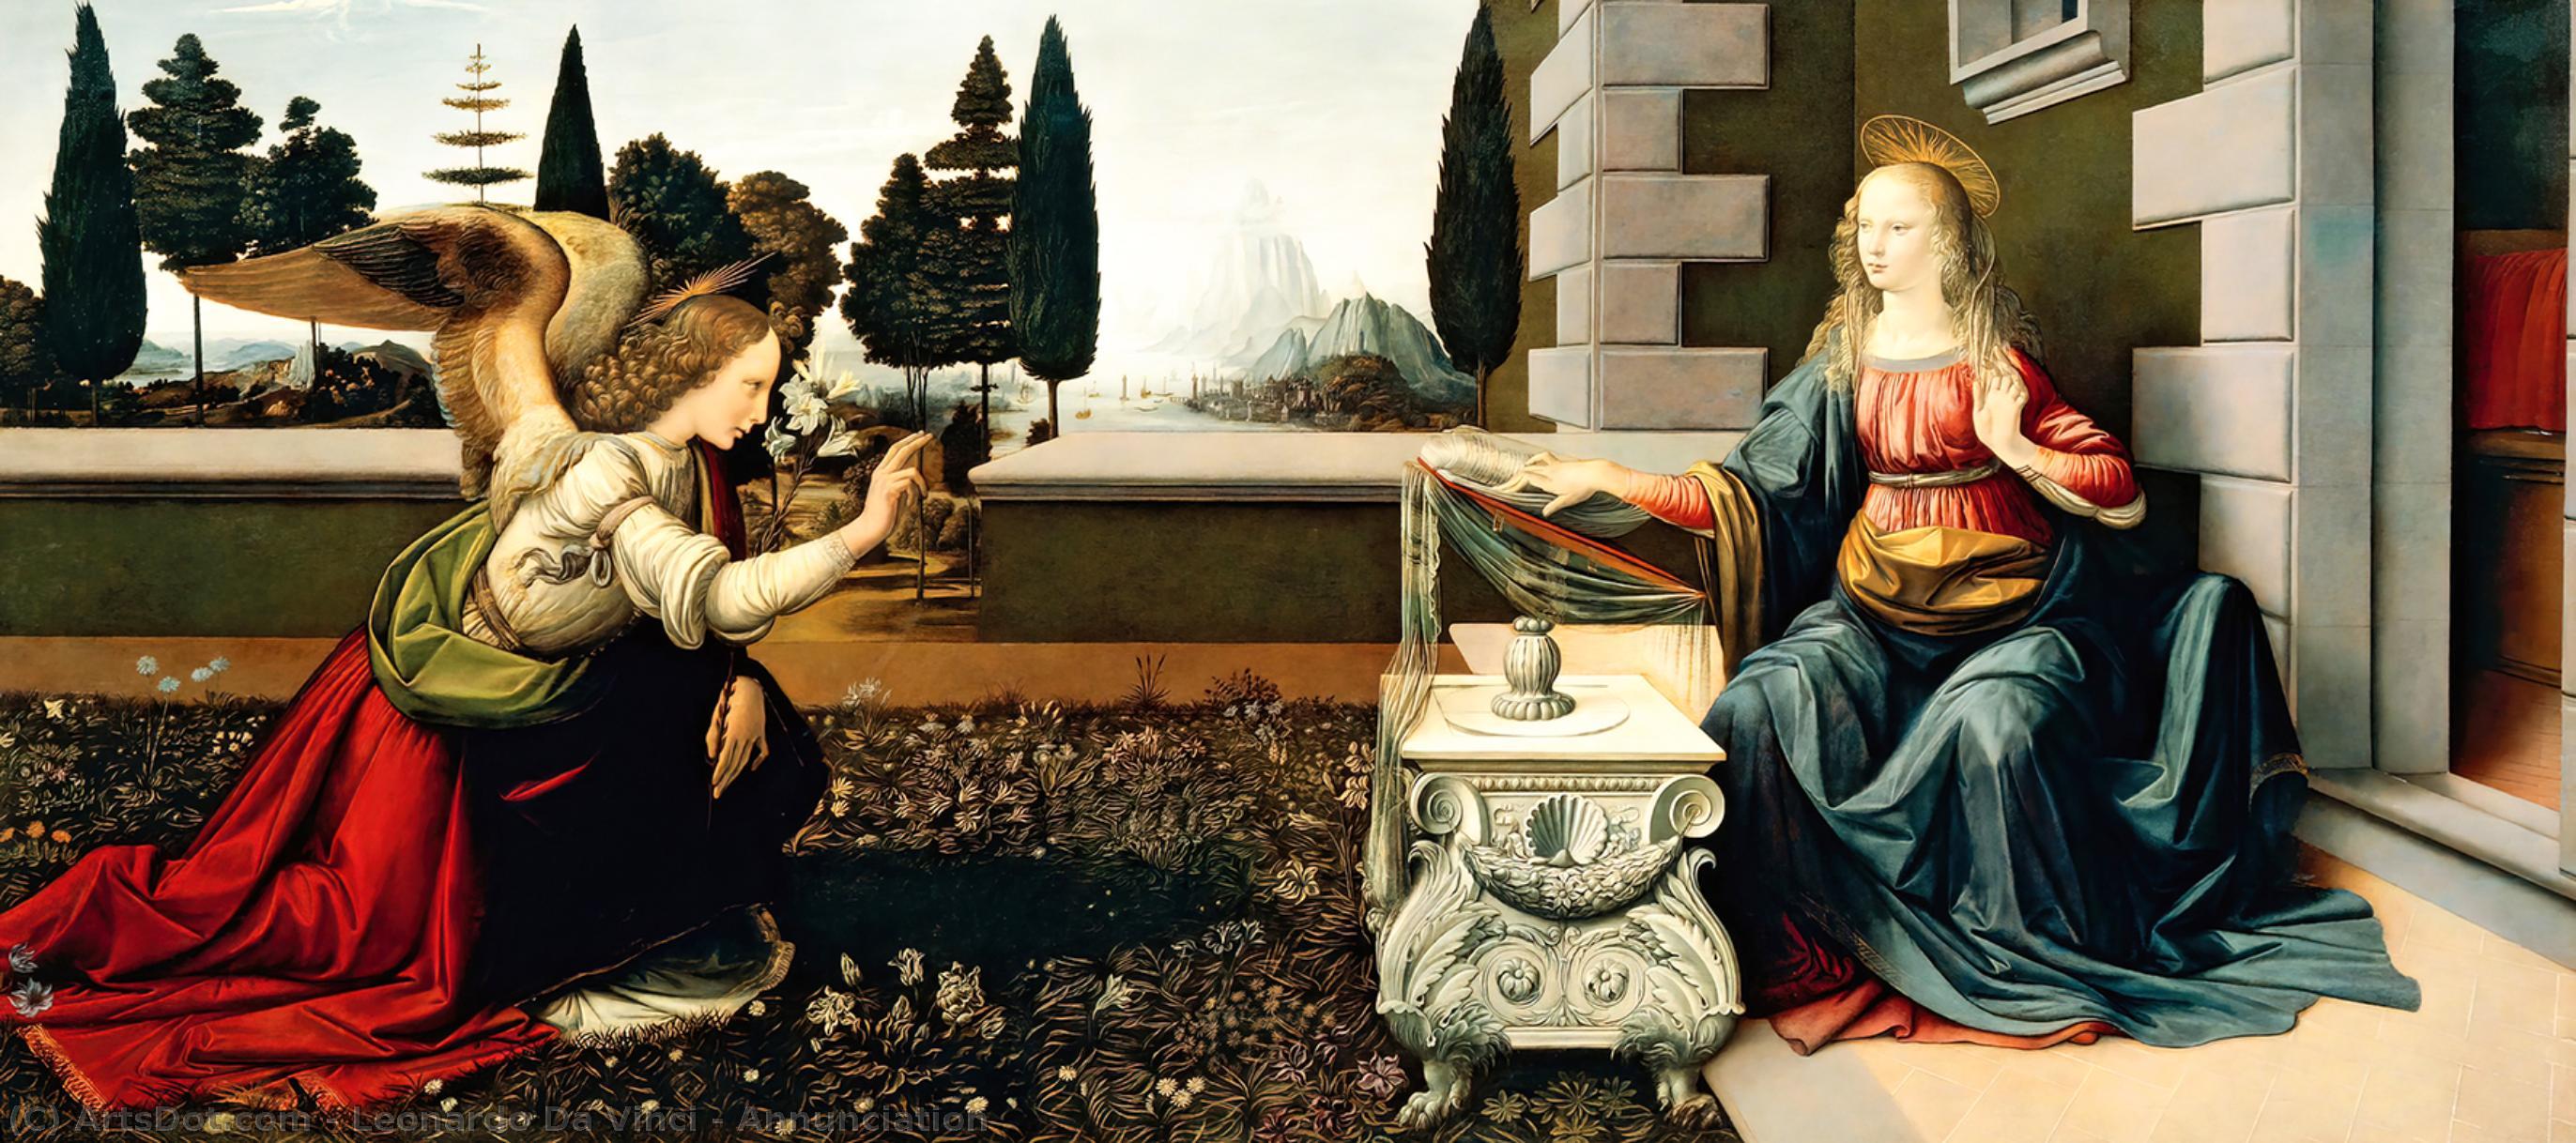 Wikioo.org - The Encyclopedia of Fine Arts - Painting, Artwork by Leonardo Da Vinci - Annunciation